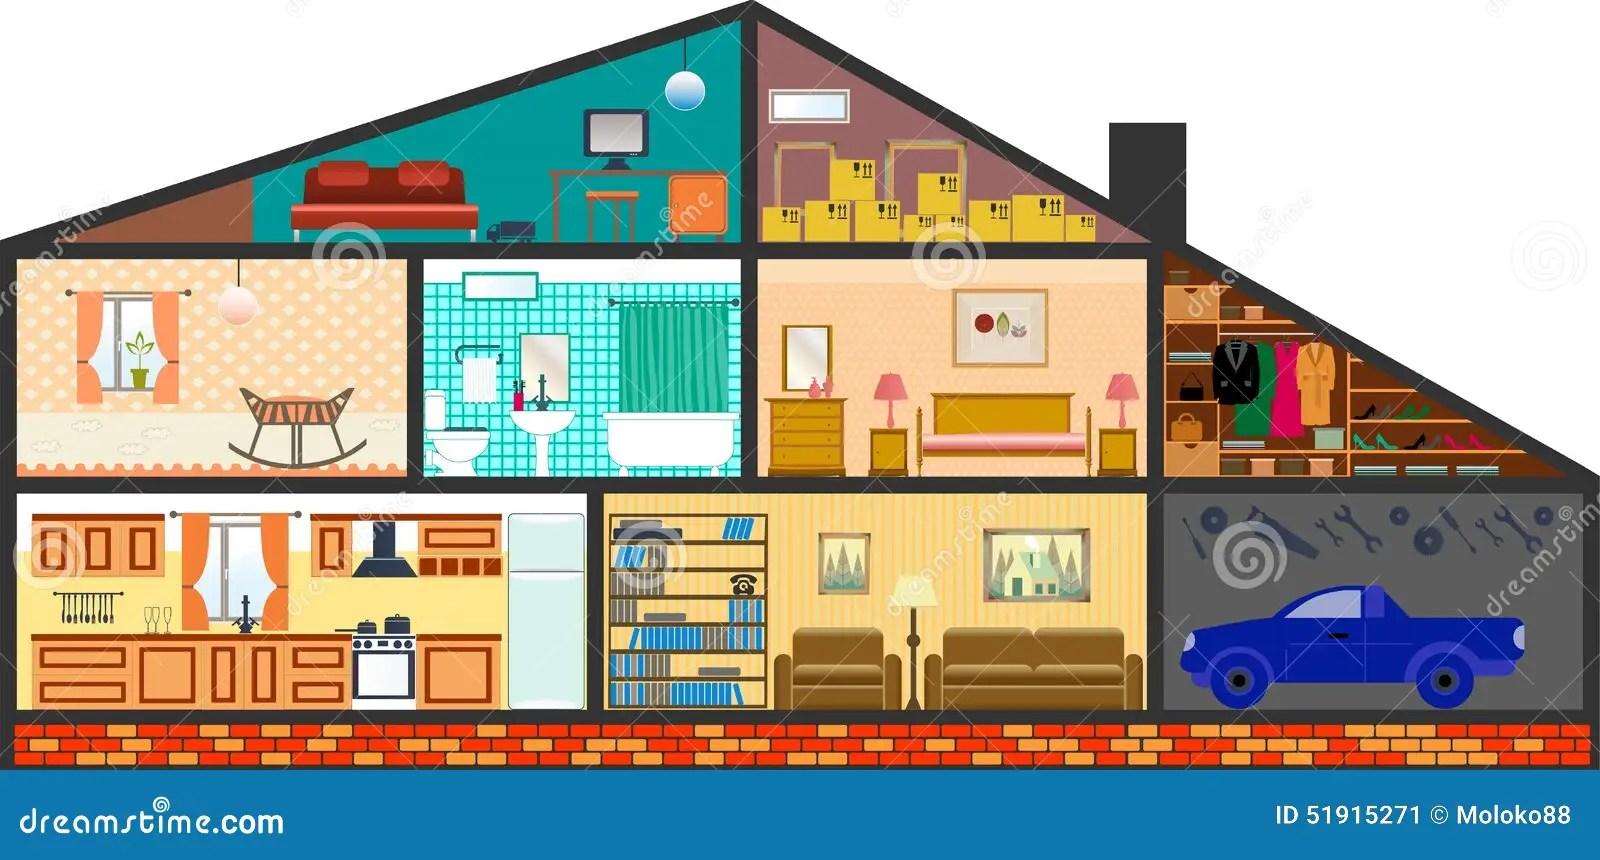 Cartoon Family House Stock Vector Illustration Of Bookshelf 51915271